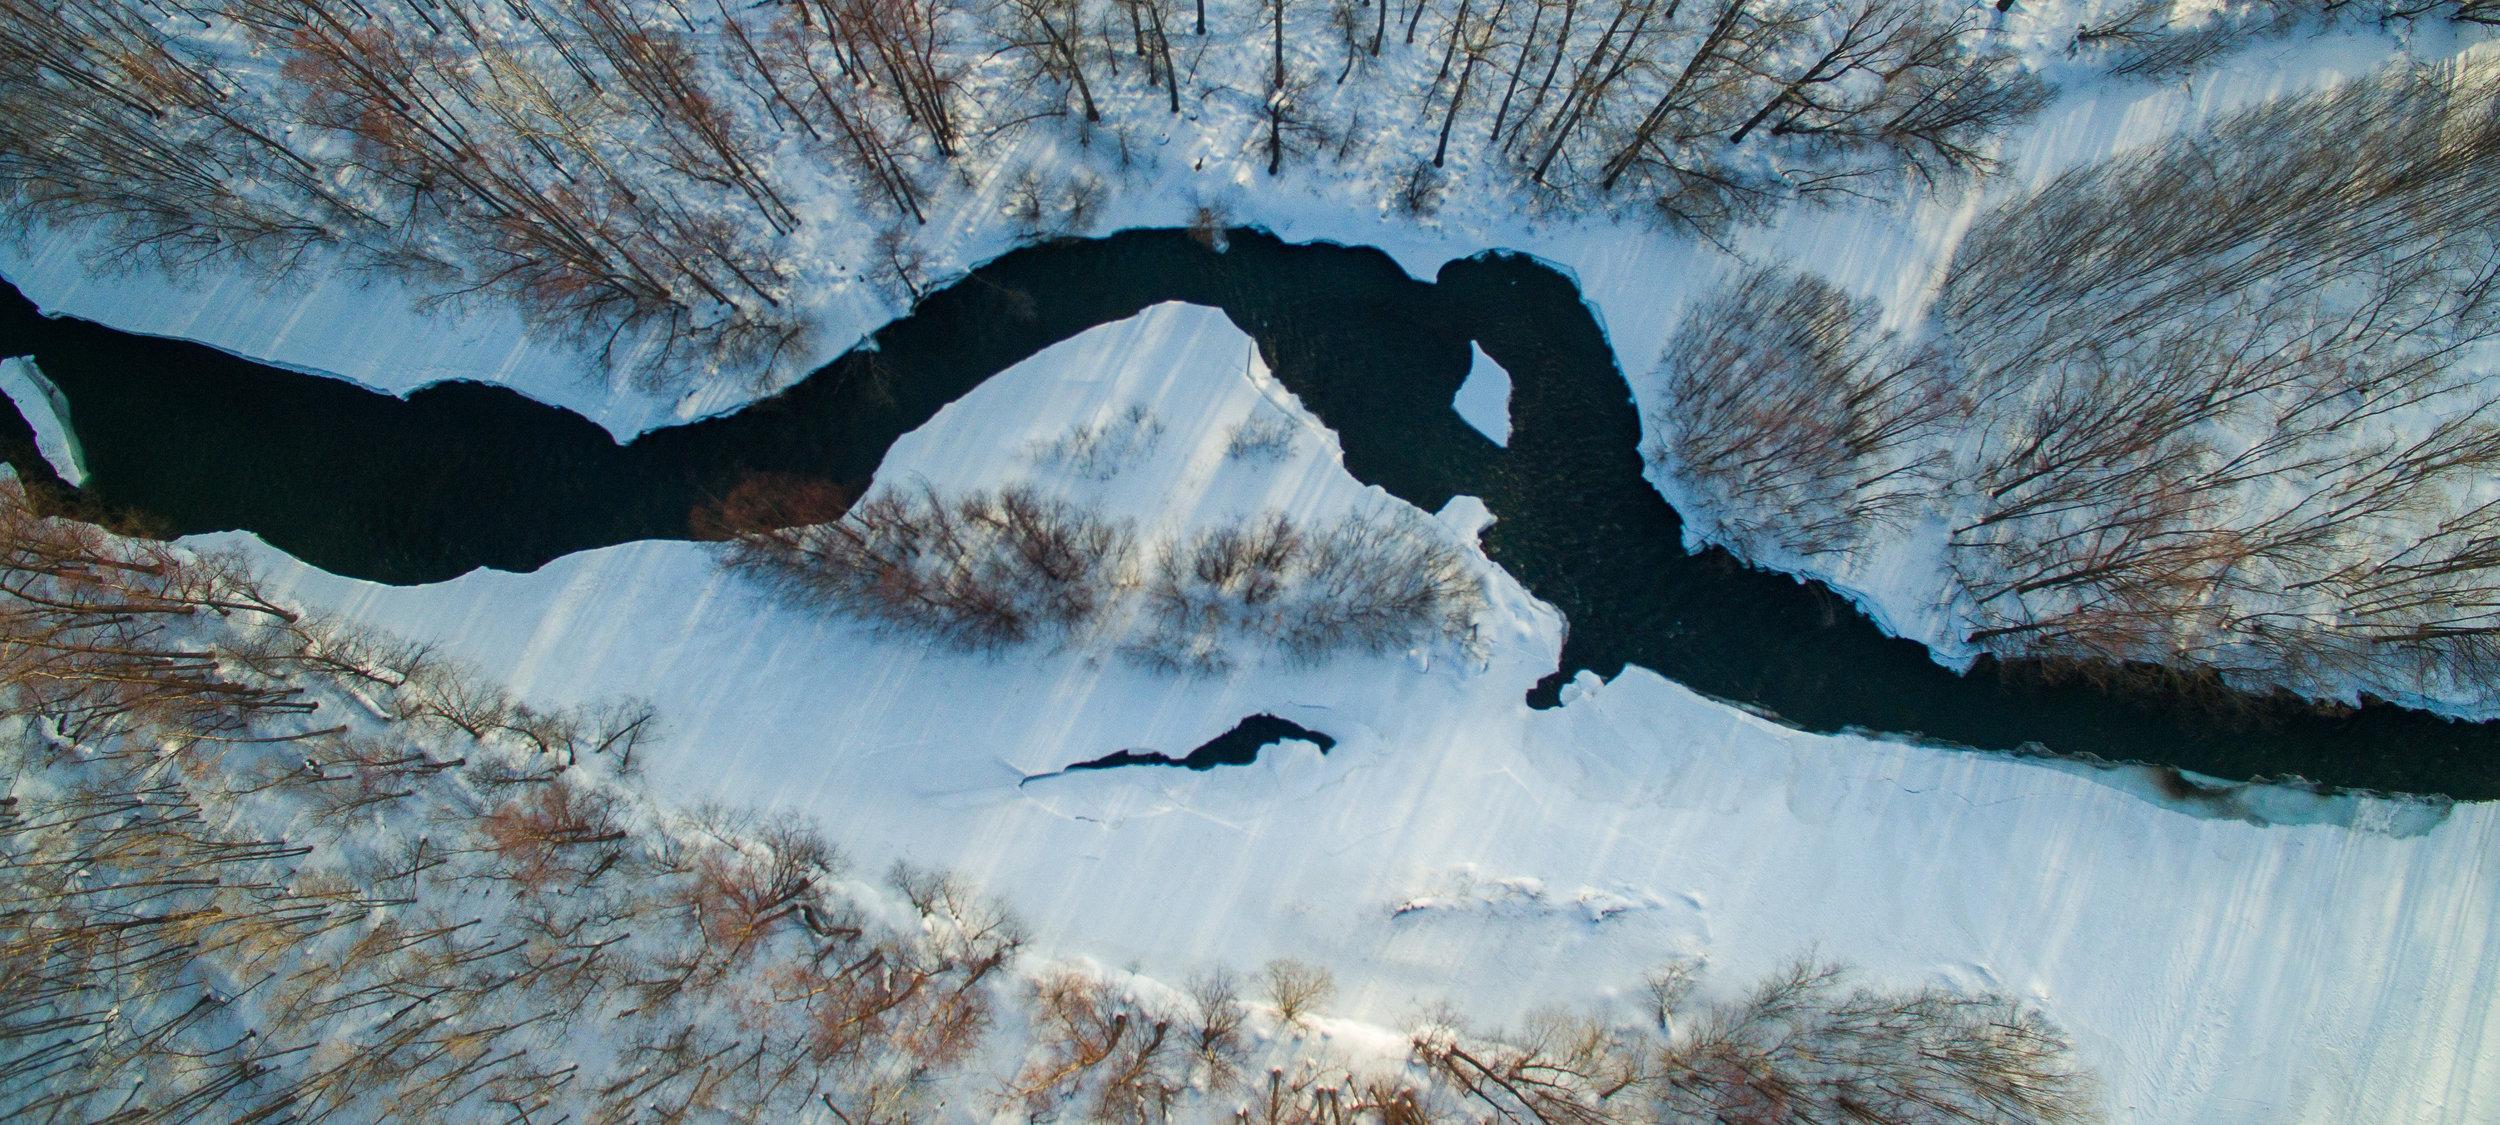 kamchatka-river-stream-wide-inertia.jpg